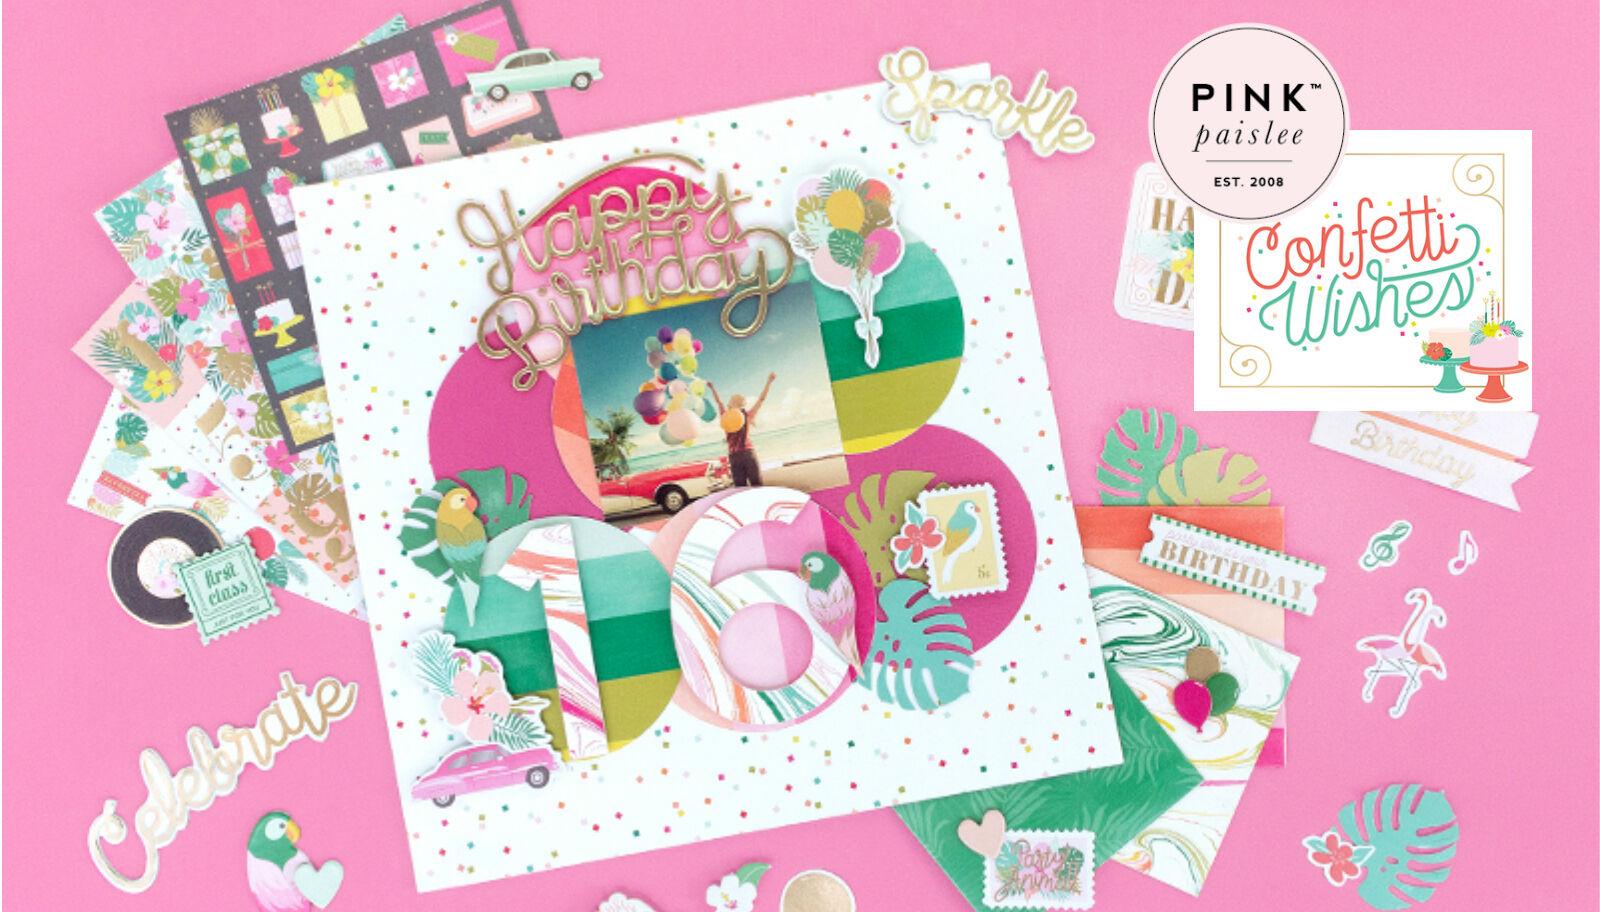 https://www.pinkandpaper.eu/kollekciok-96/pink-paislee-confetti-wishes-235